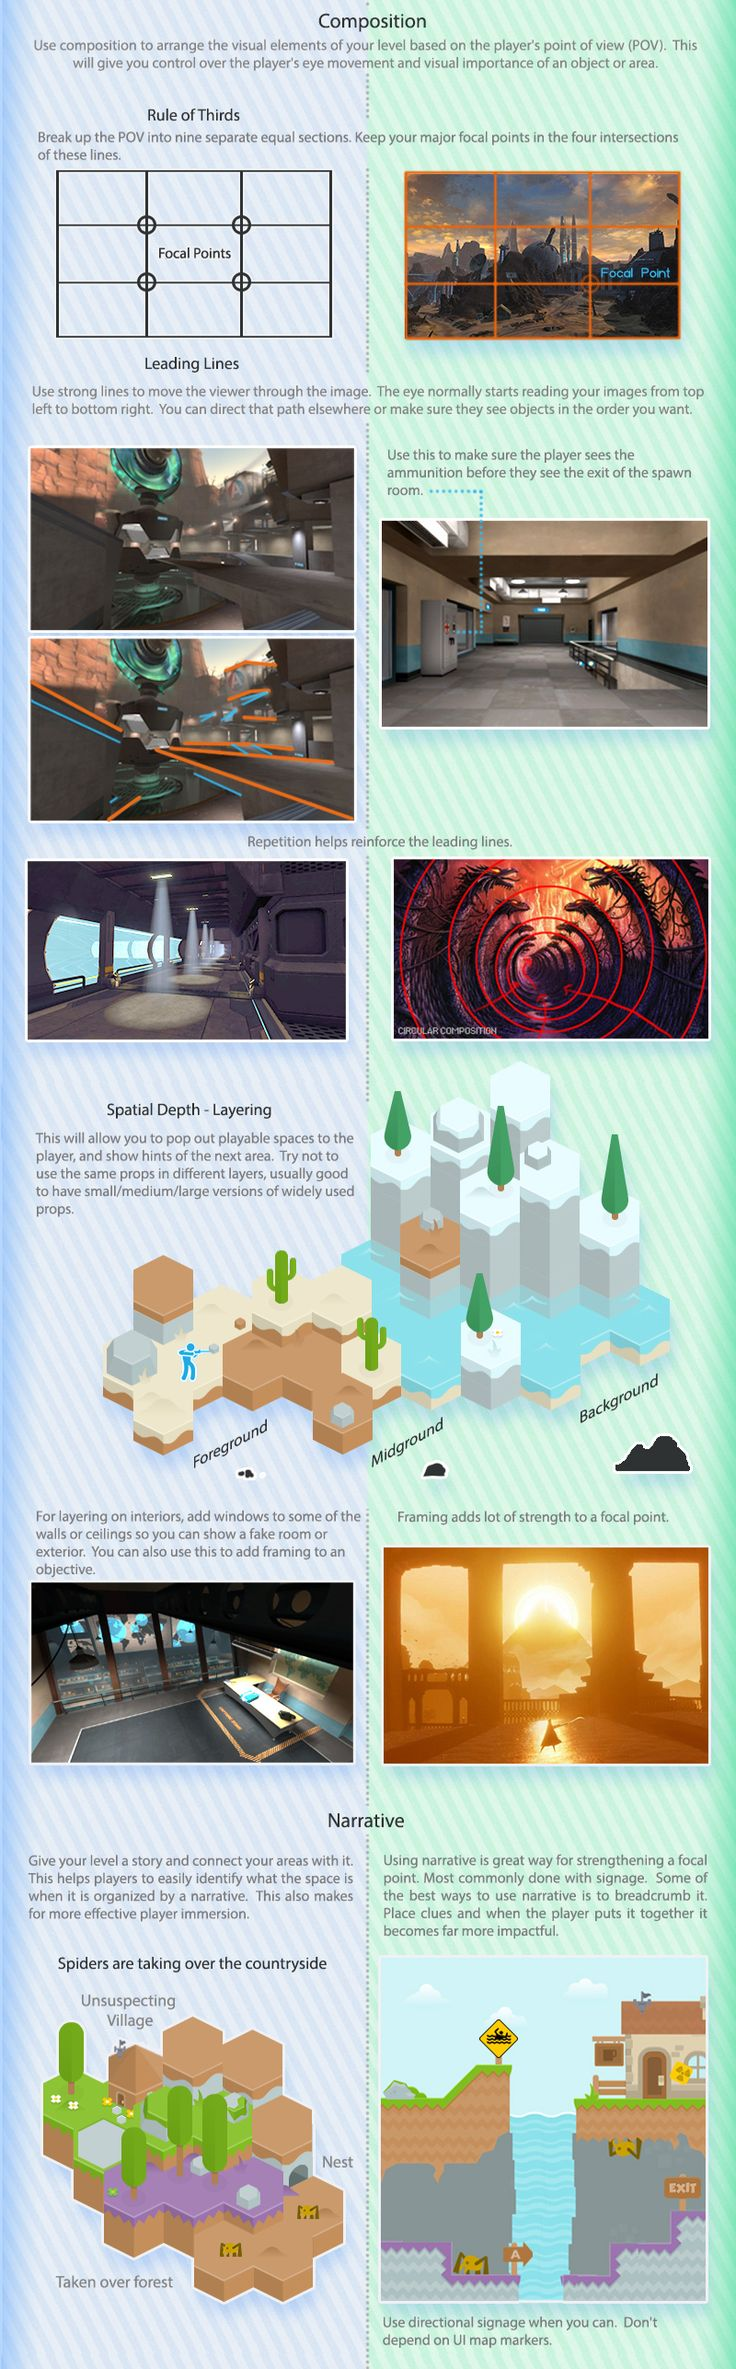 The Visual Guide for Multiplayer Level Design, Bobby Ross. Chapter 5: Orientation & Navigation B. http://bobbyross.com/blog/2014/6/29/the-visual-guide-for-multiplayer-level-design